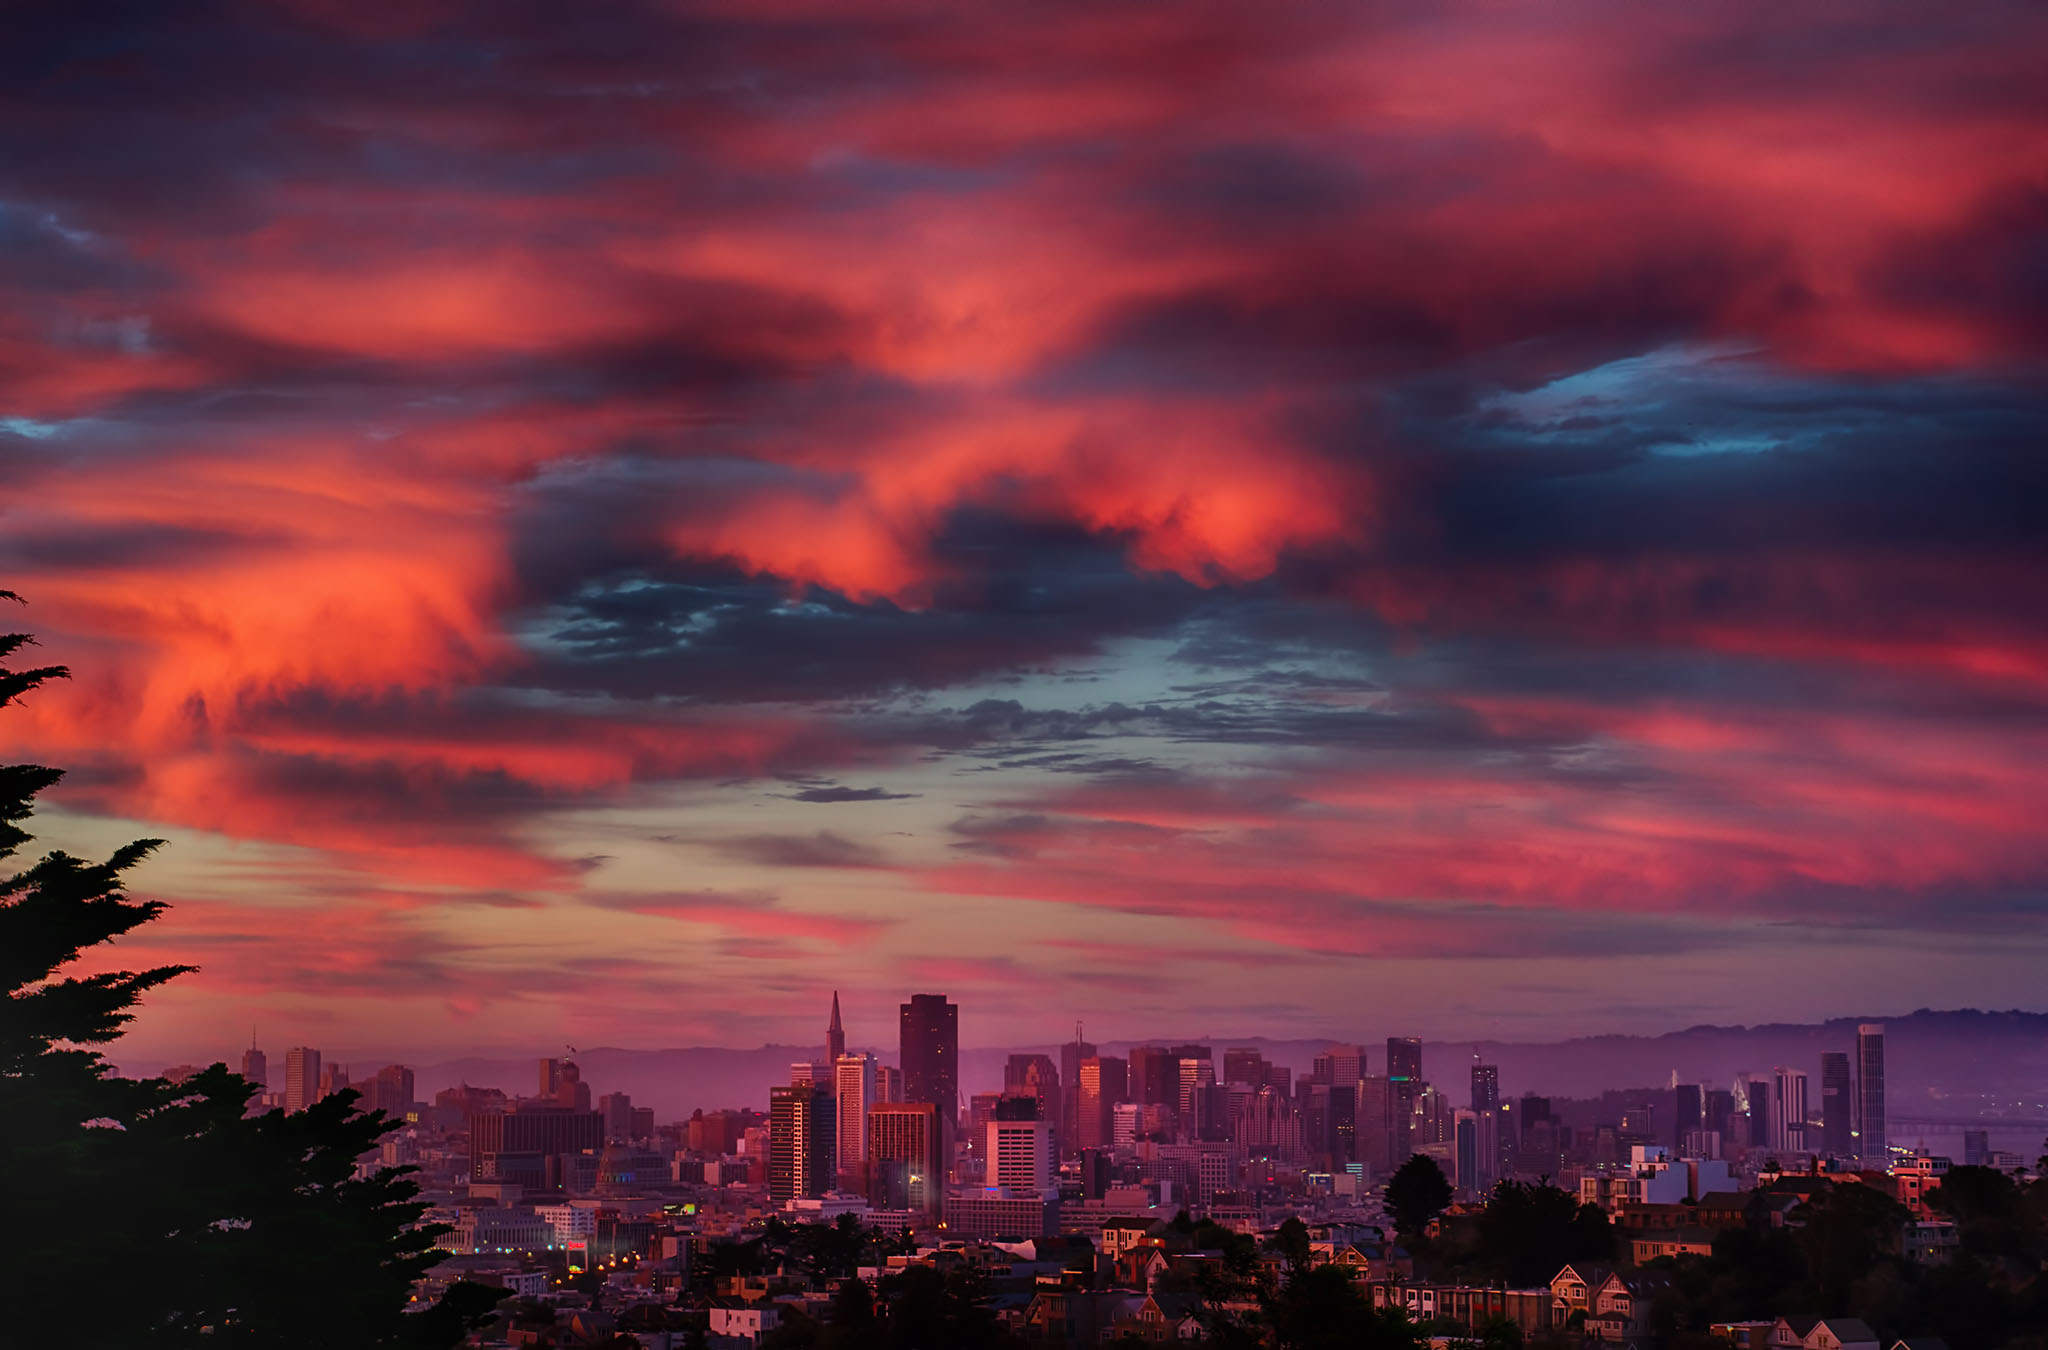 Last Light of Summer Solstice over San Francisco 2